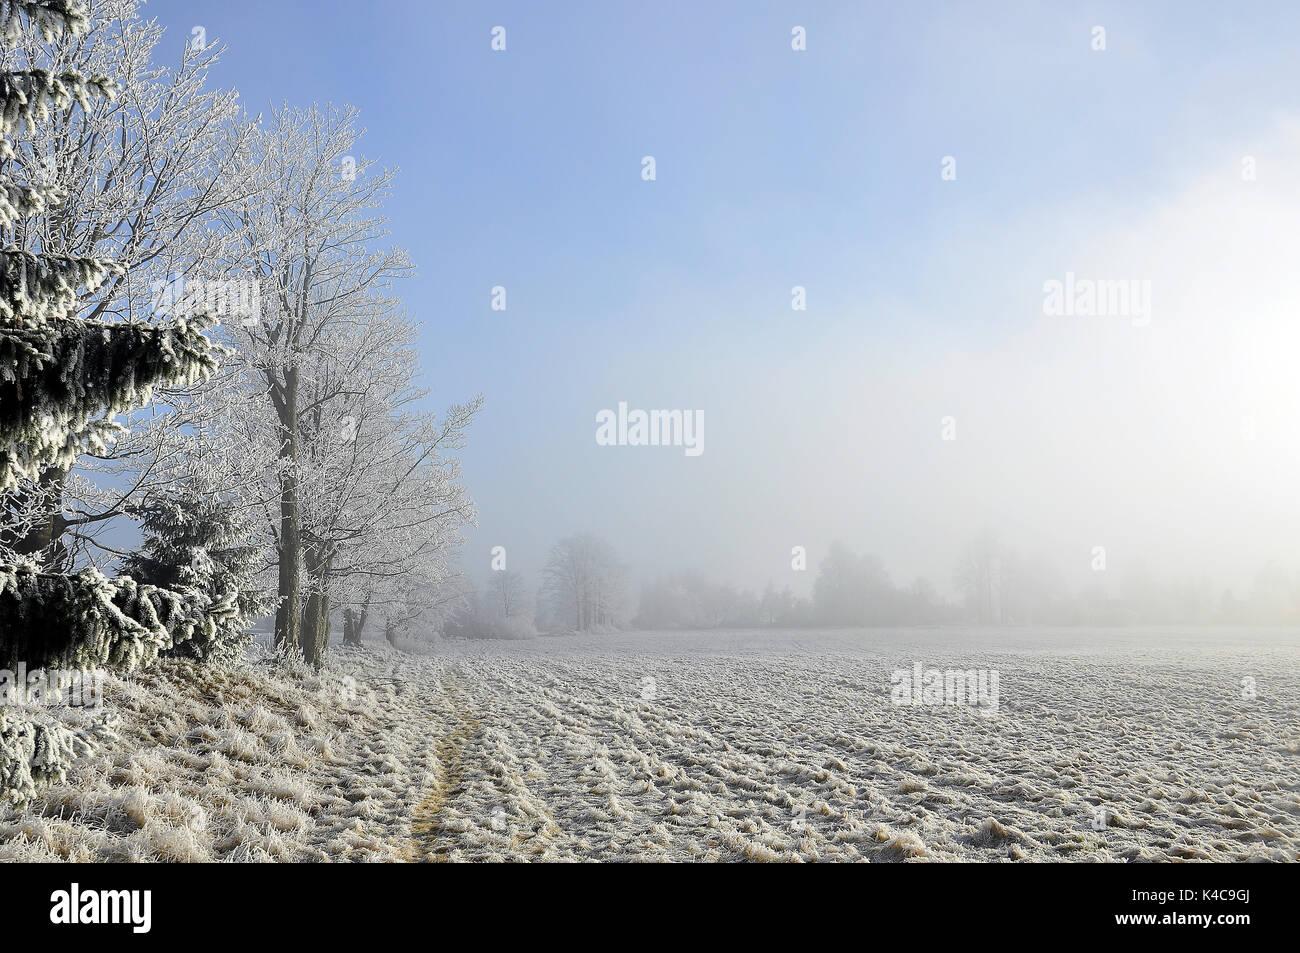 Waldrand Im Winter Im Dunst - Stock Image